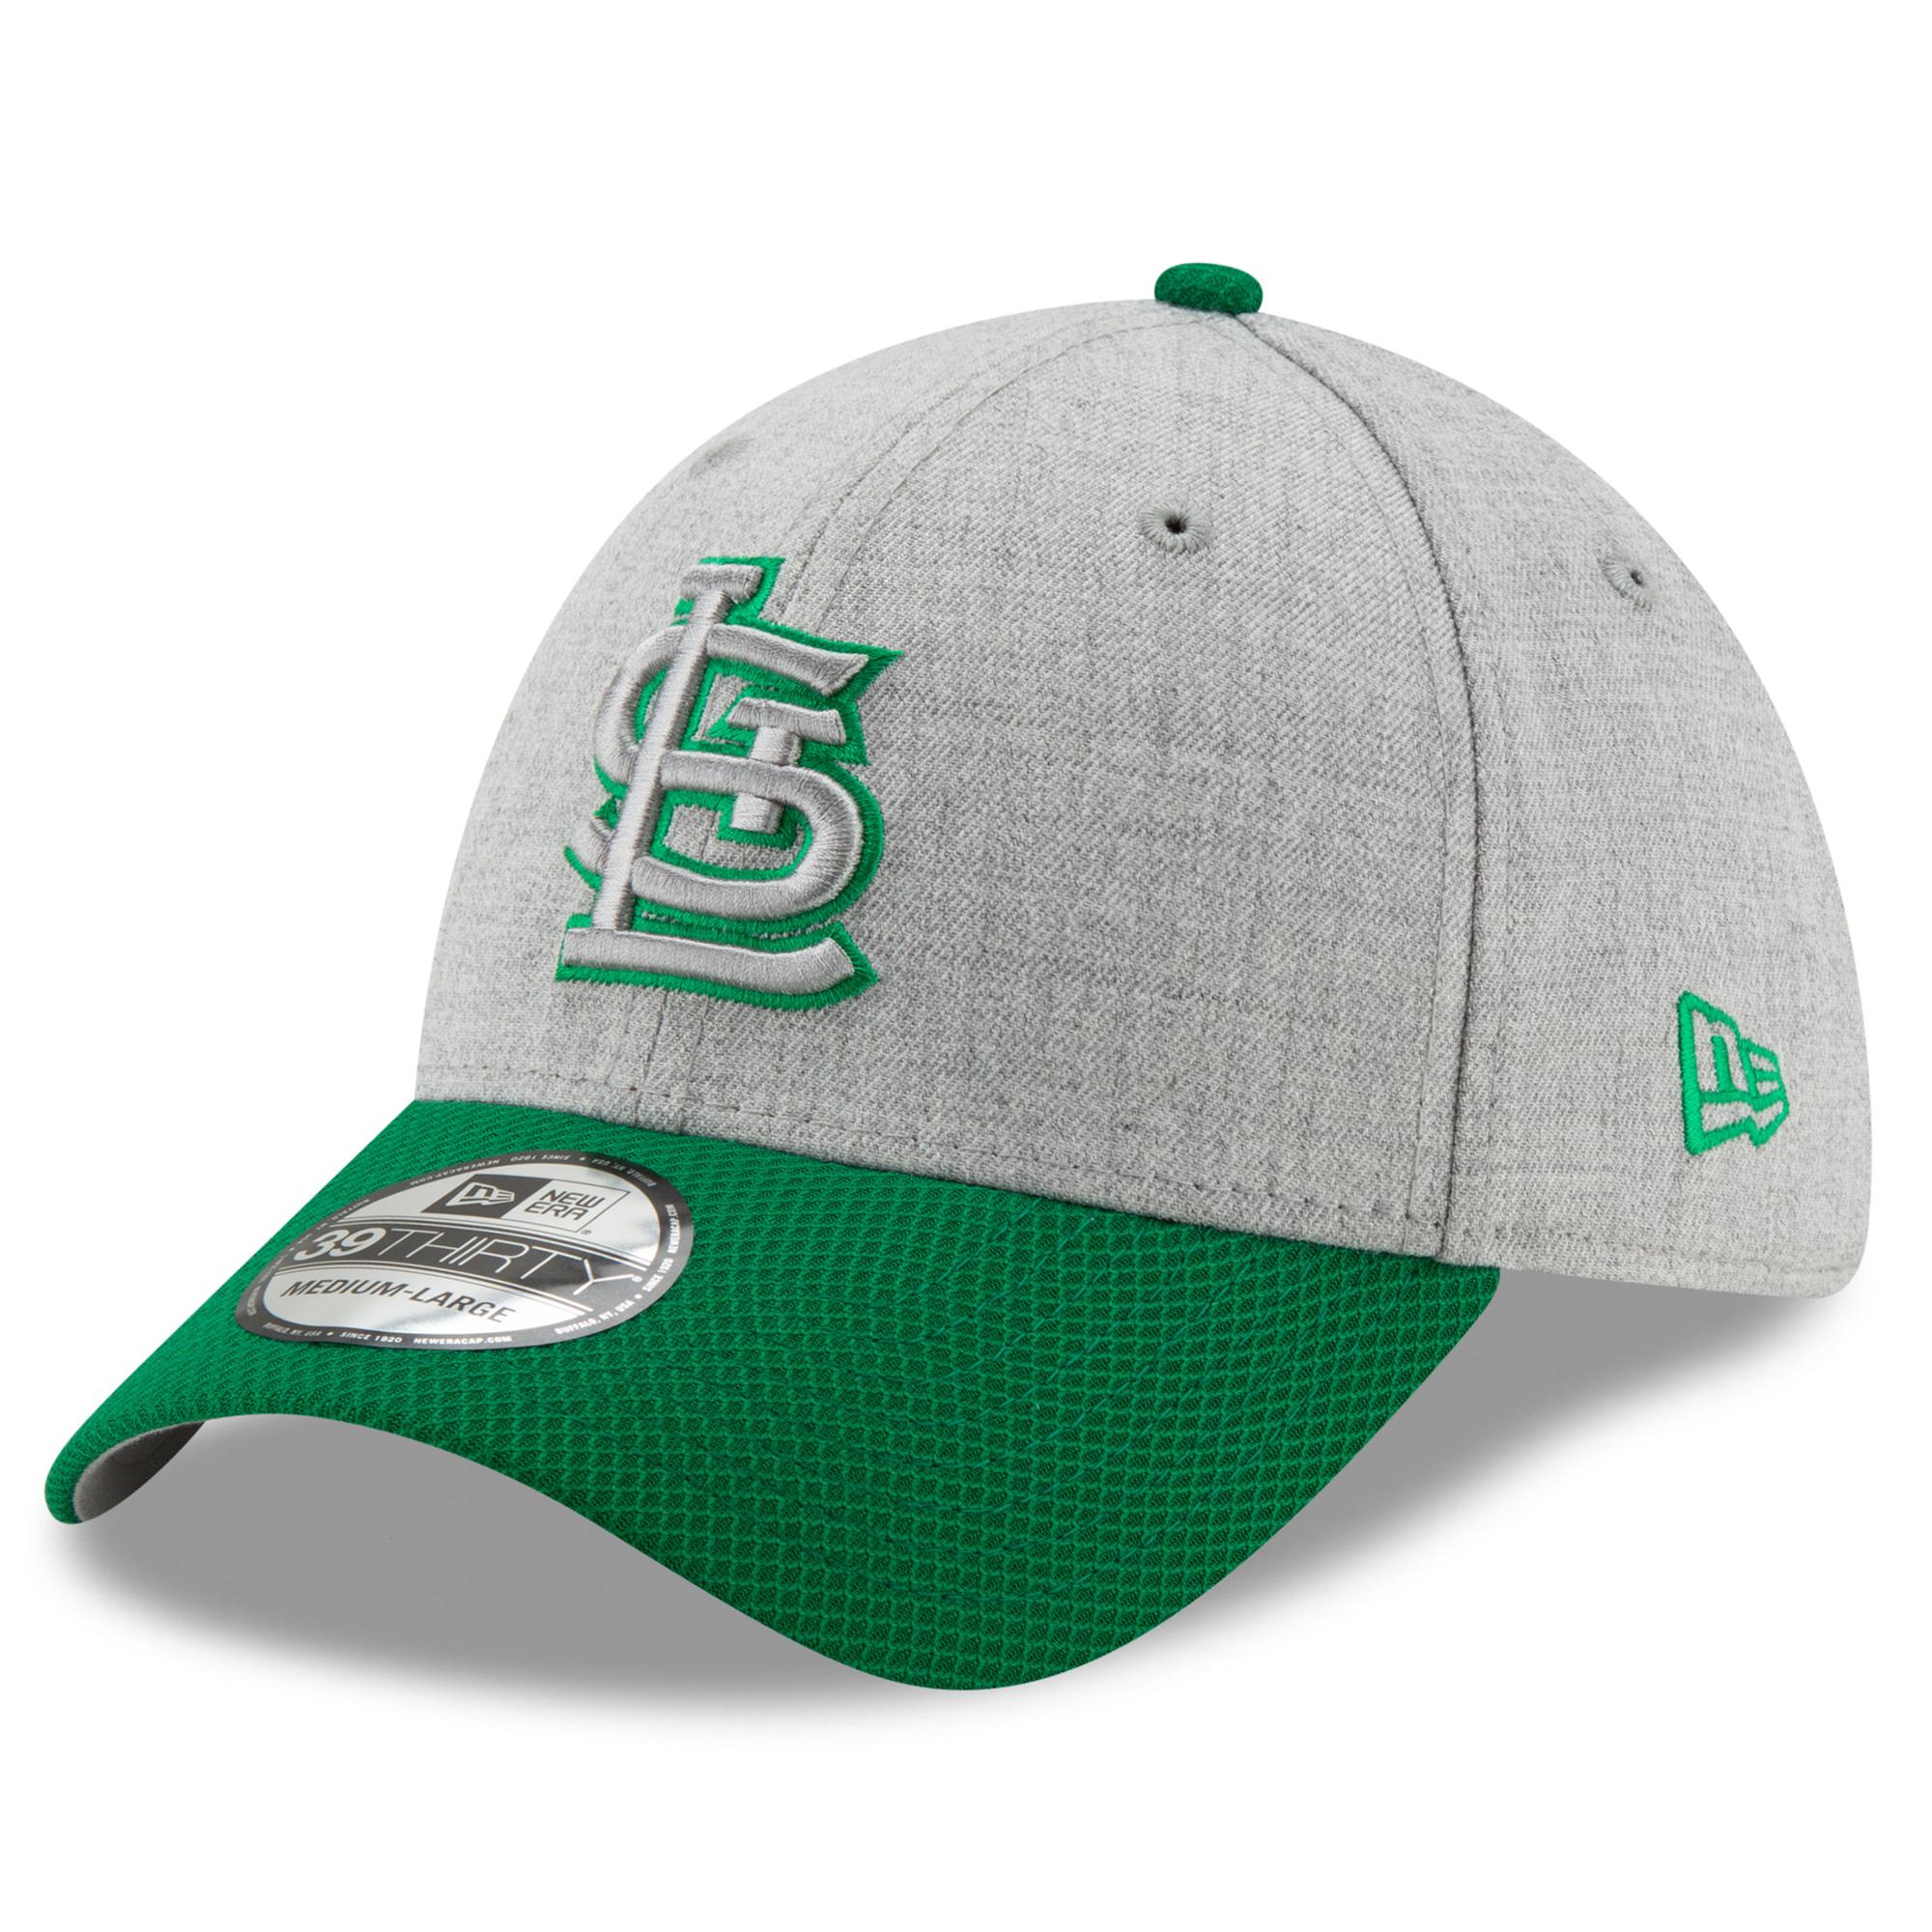 St. Louis Cardinals New Era St. Patrick's Day Change Up Redux 39THIRTY Flex Hat - Gray/Green